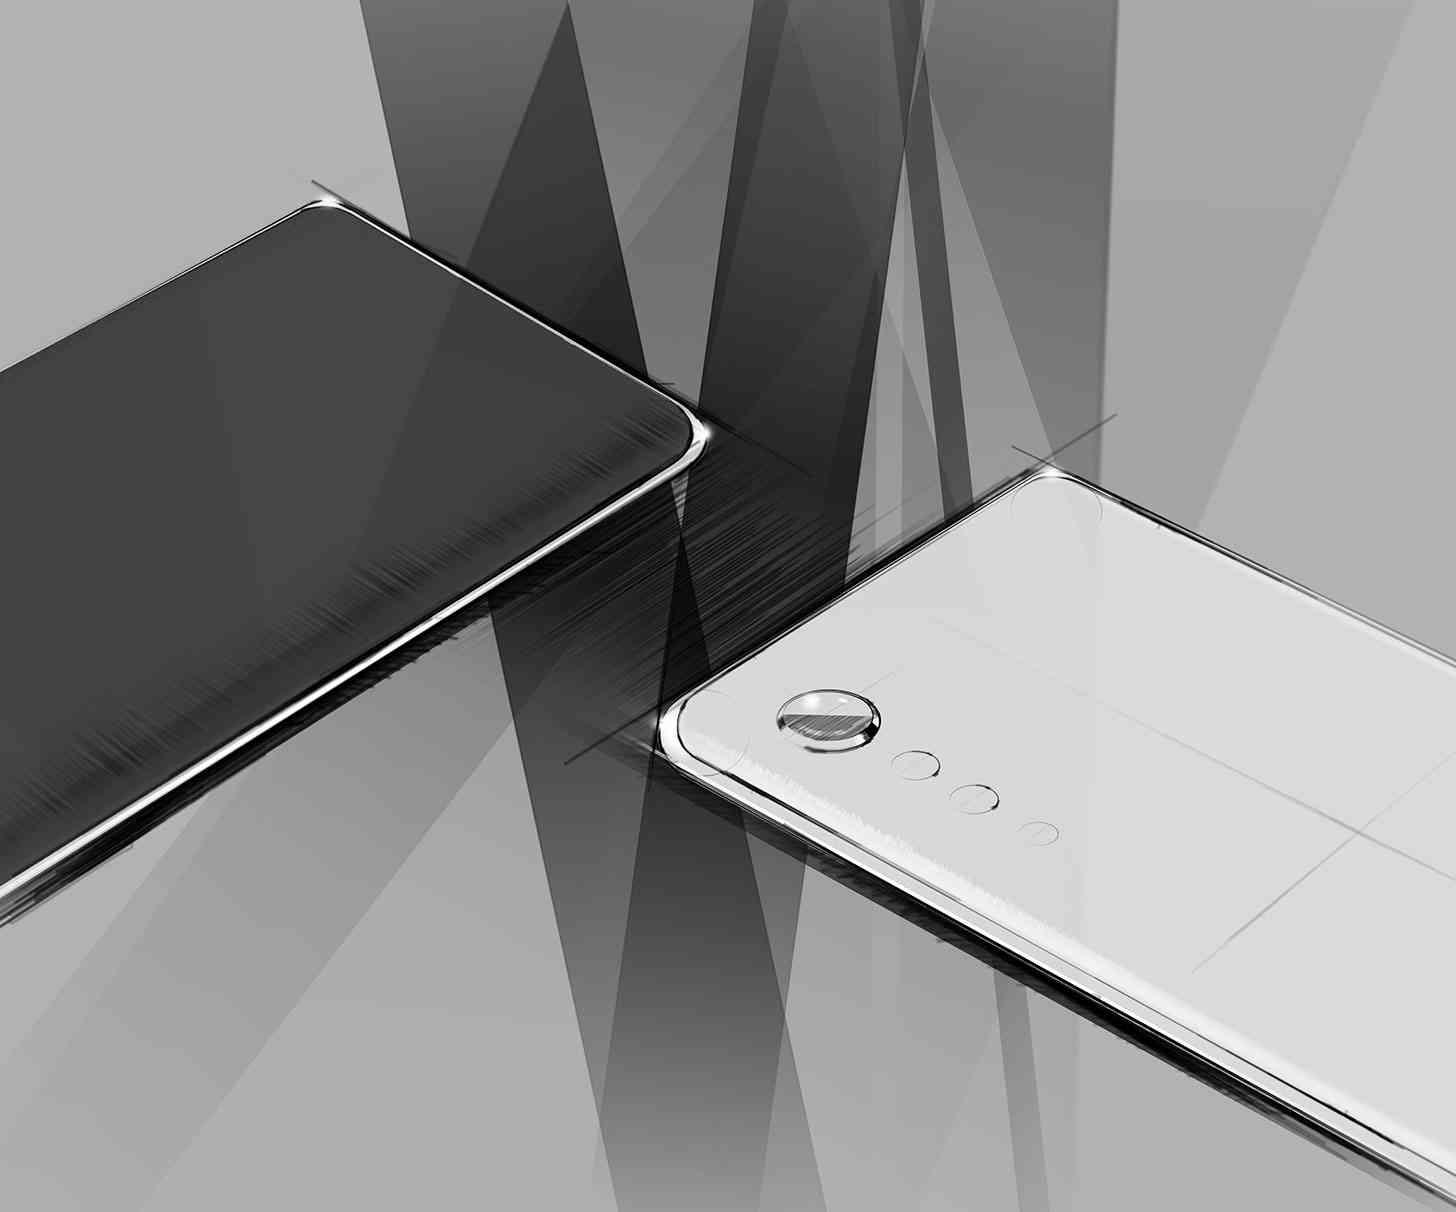 LG phone minimalistic phone design